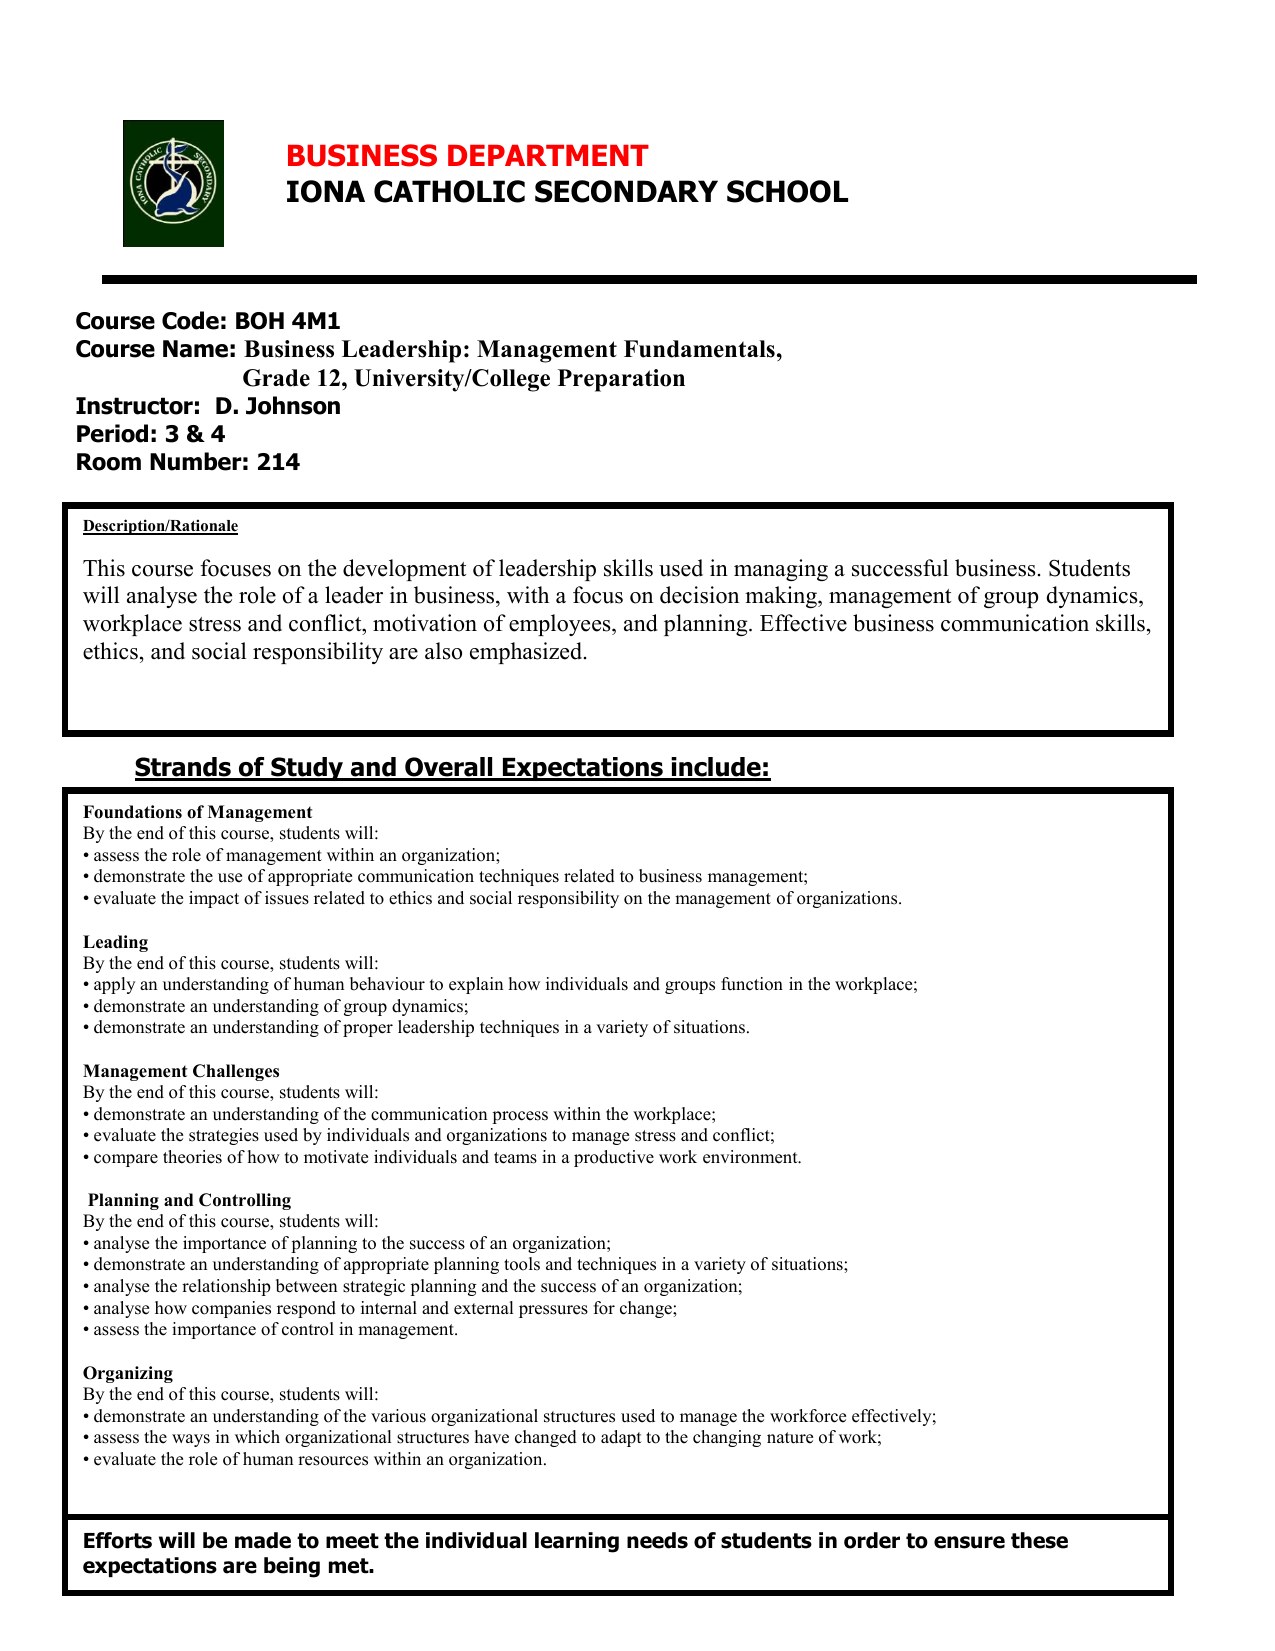 IONA CATHOLIC SECONDARY SCHOOL BUSINESS DEPARTMENT Business